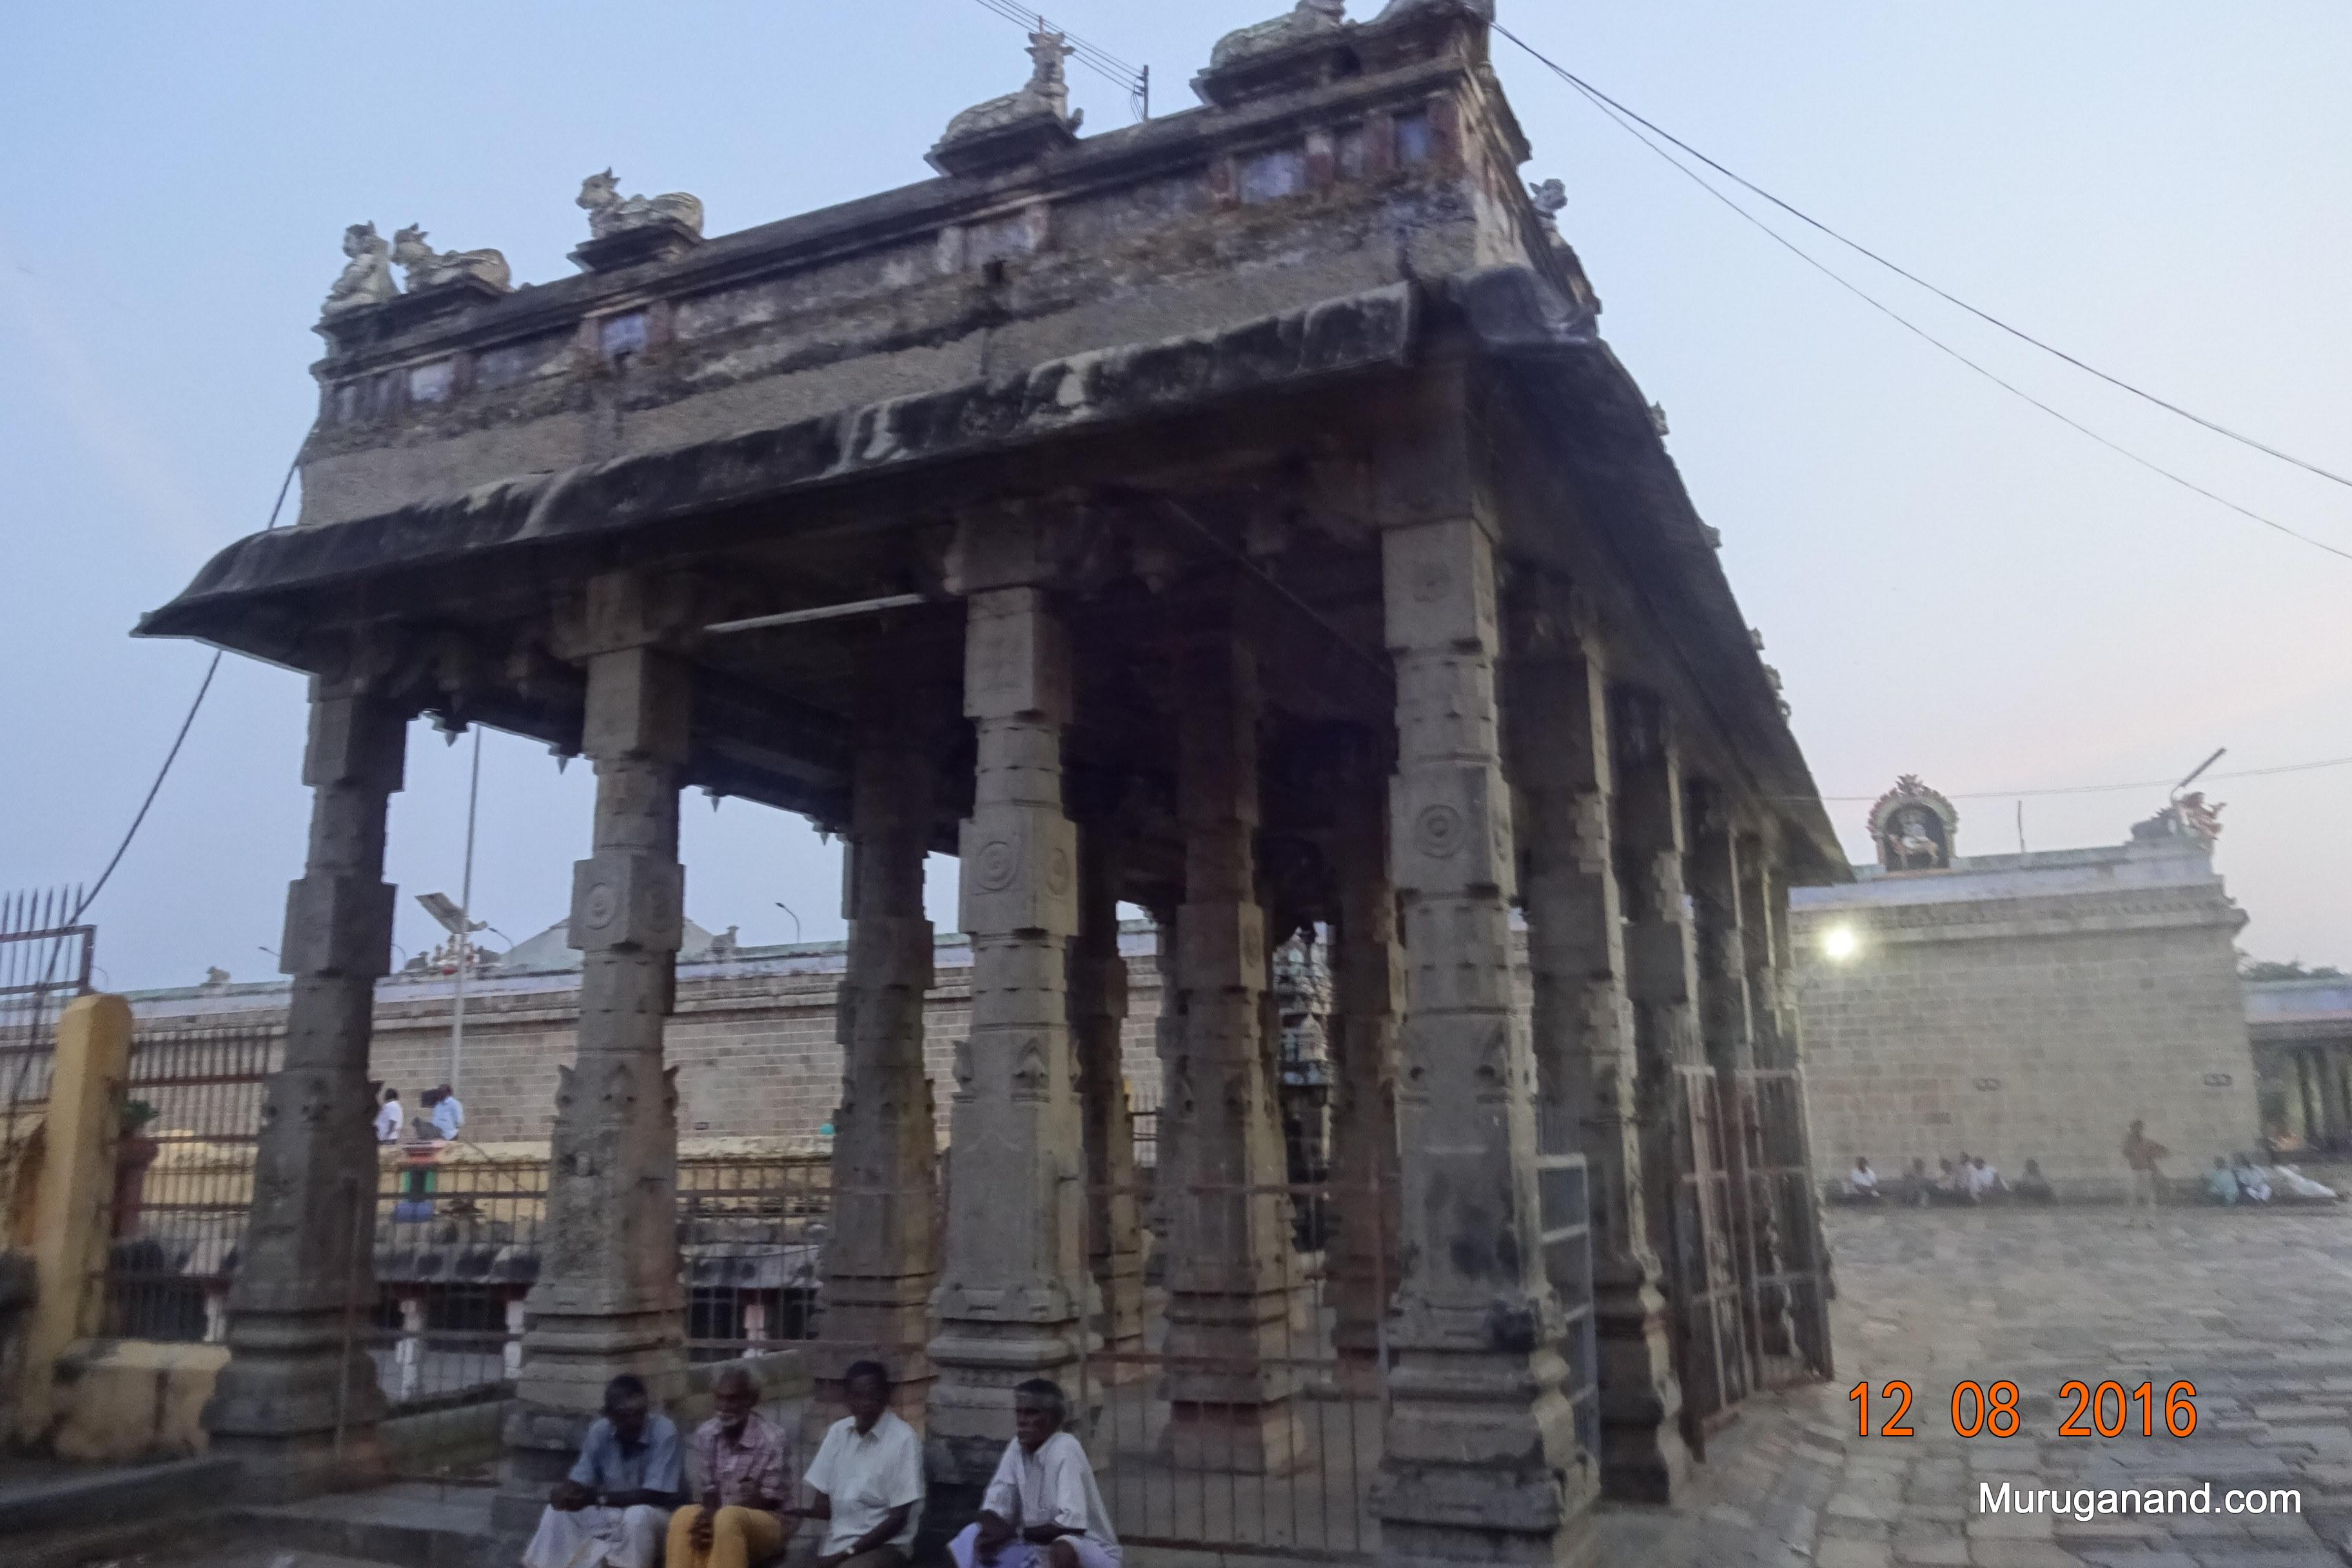 Mandapam entry to the Sivganga Tank. It is facing 100 pillared hall.